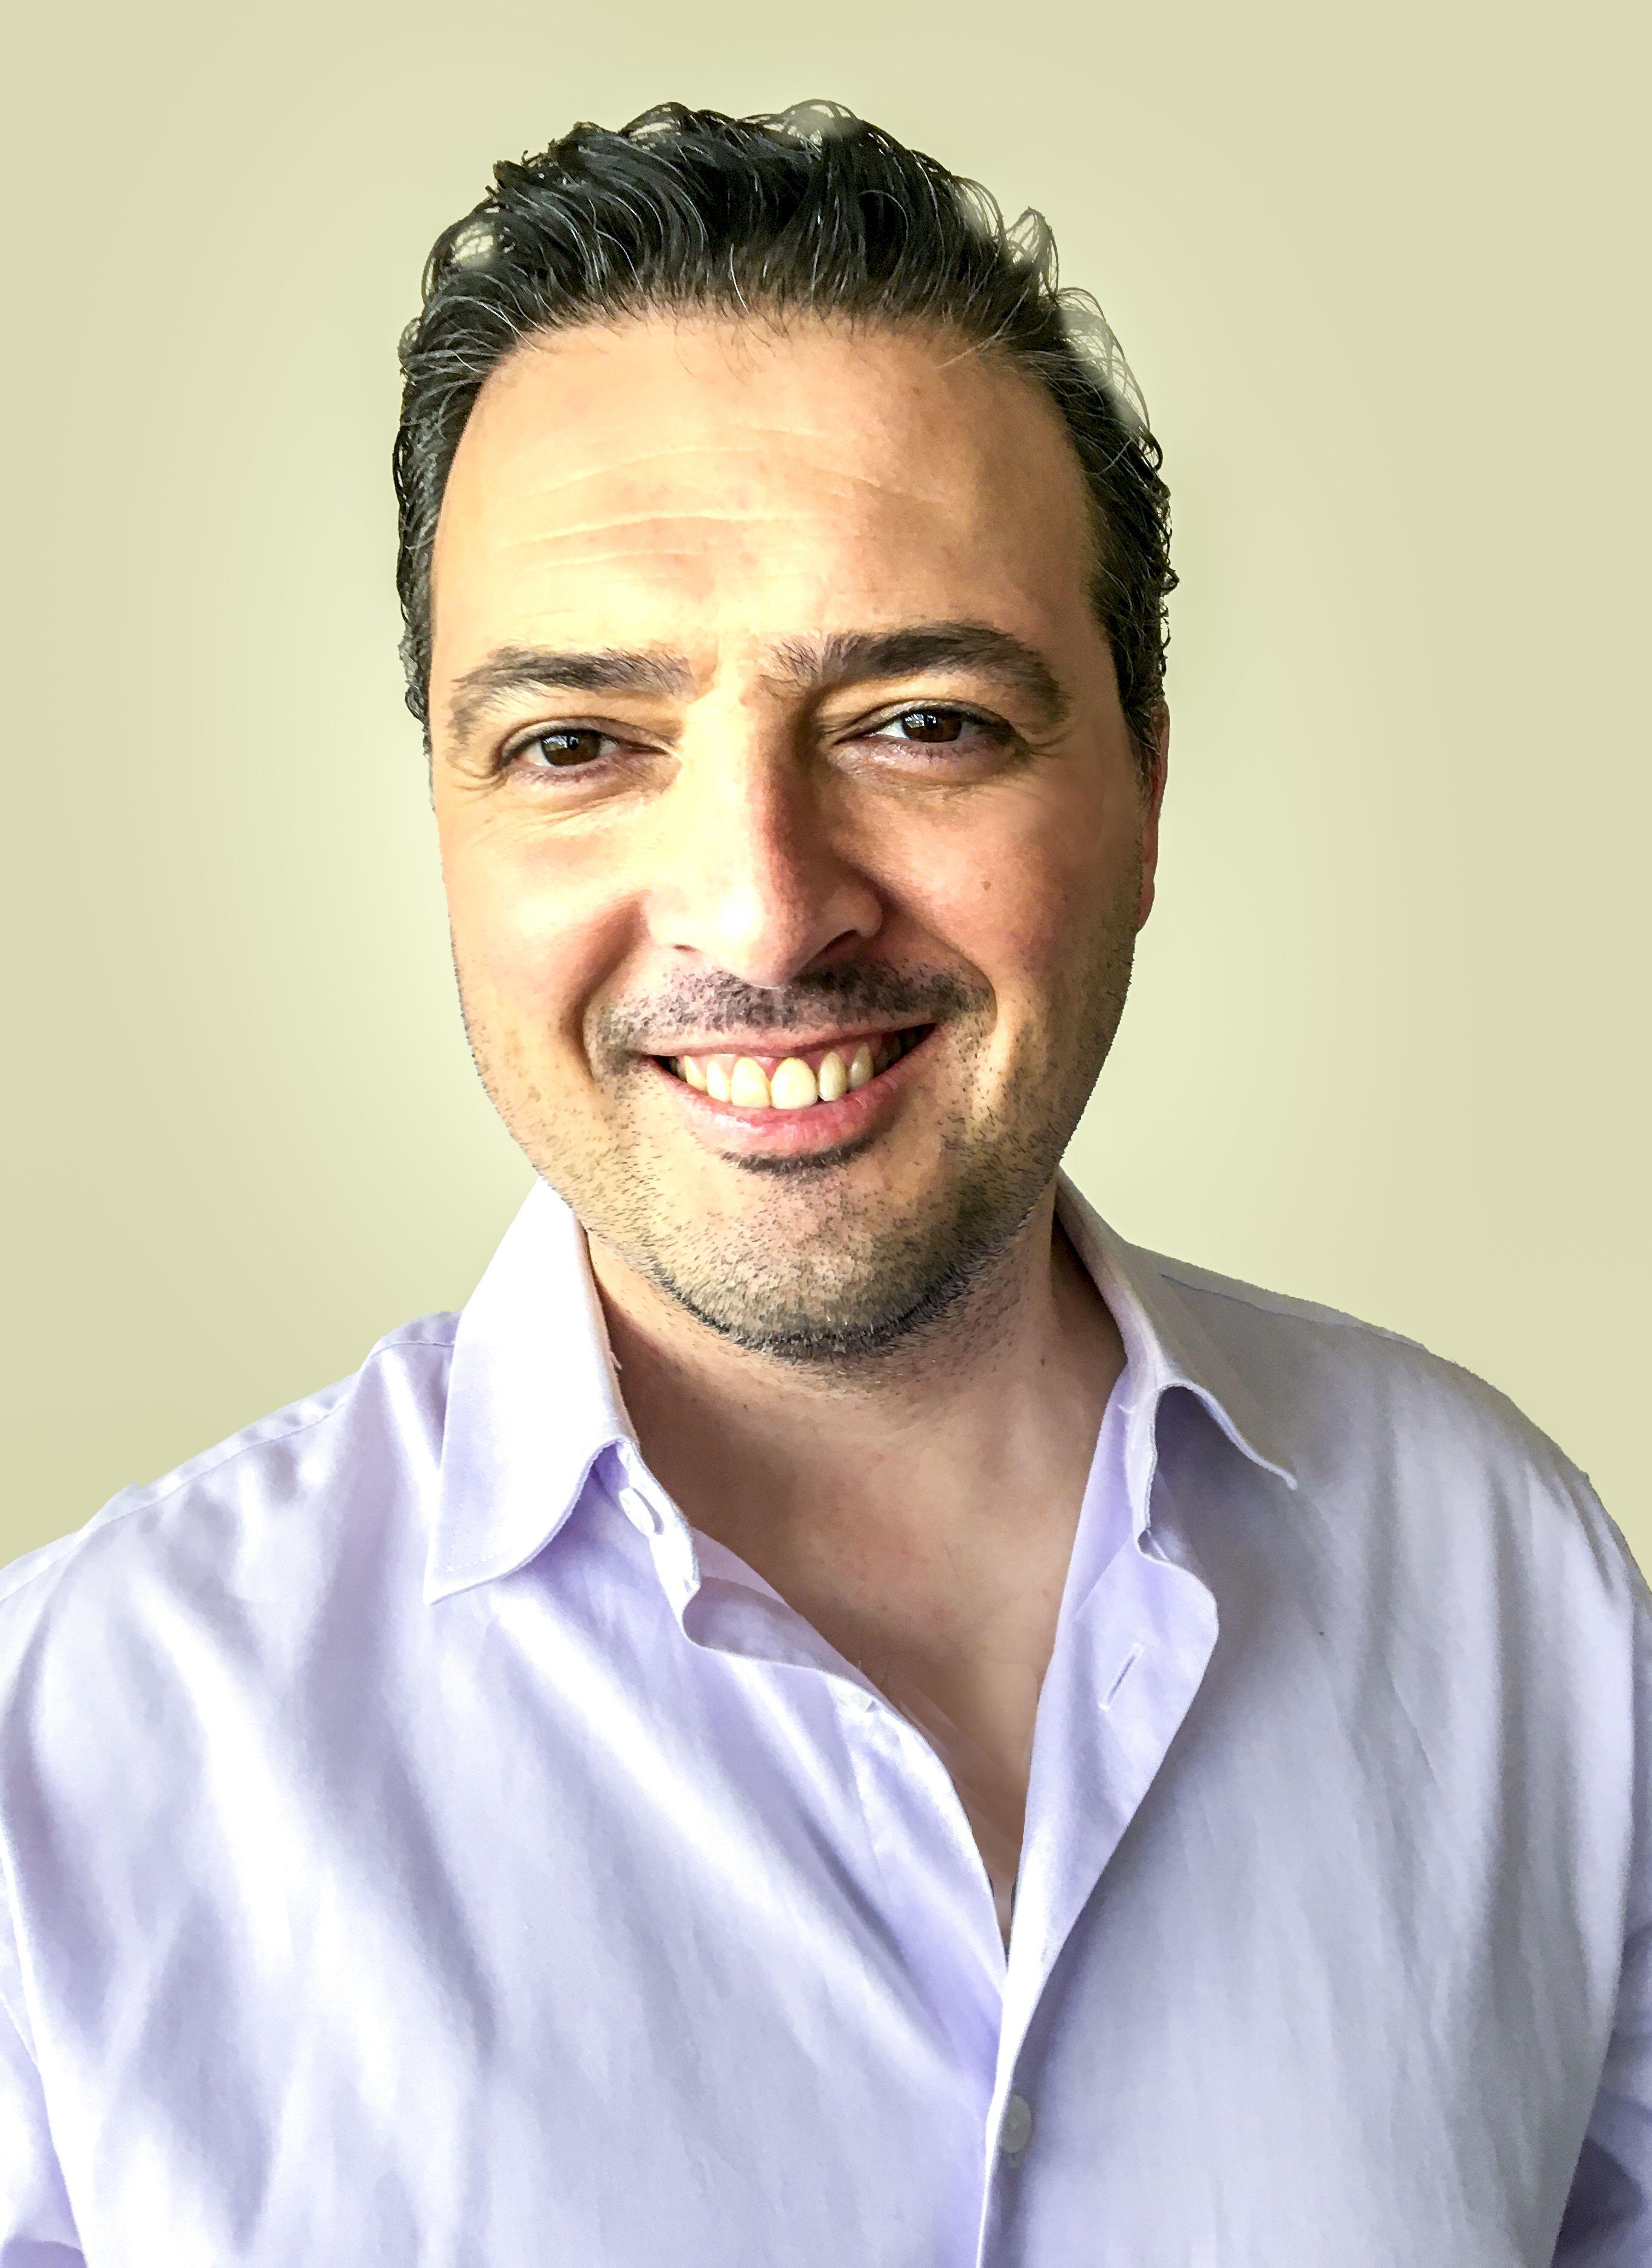 Eduardo Pires Coelho